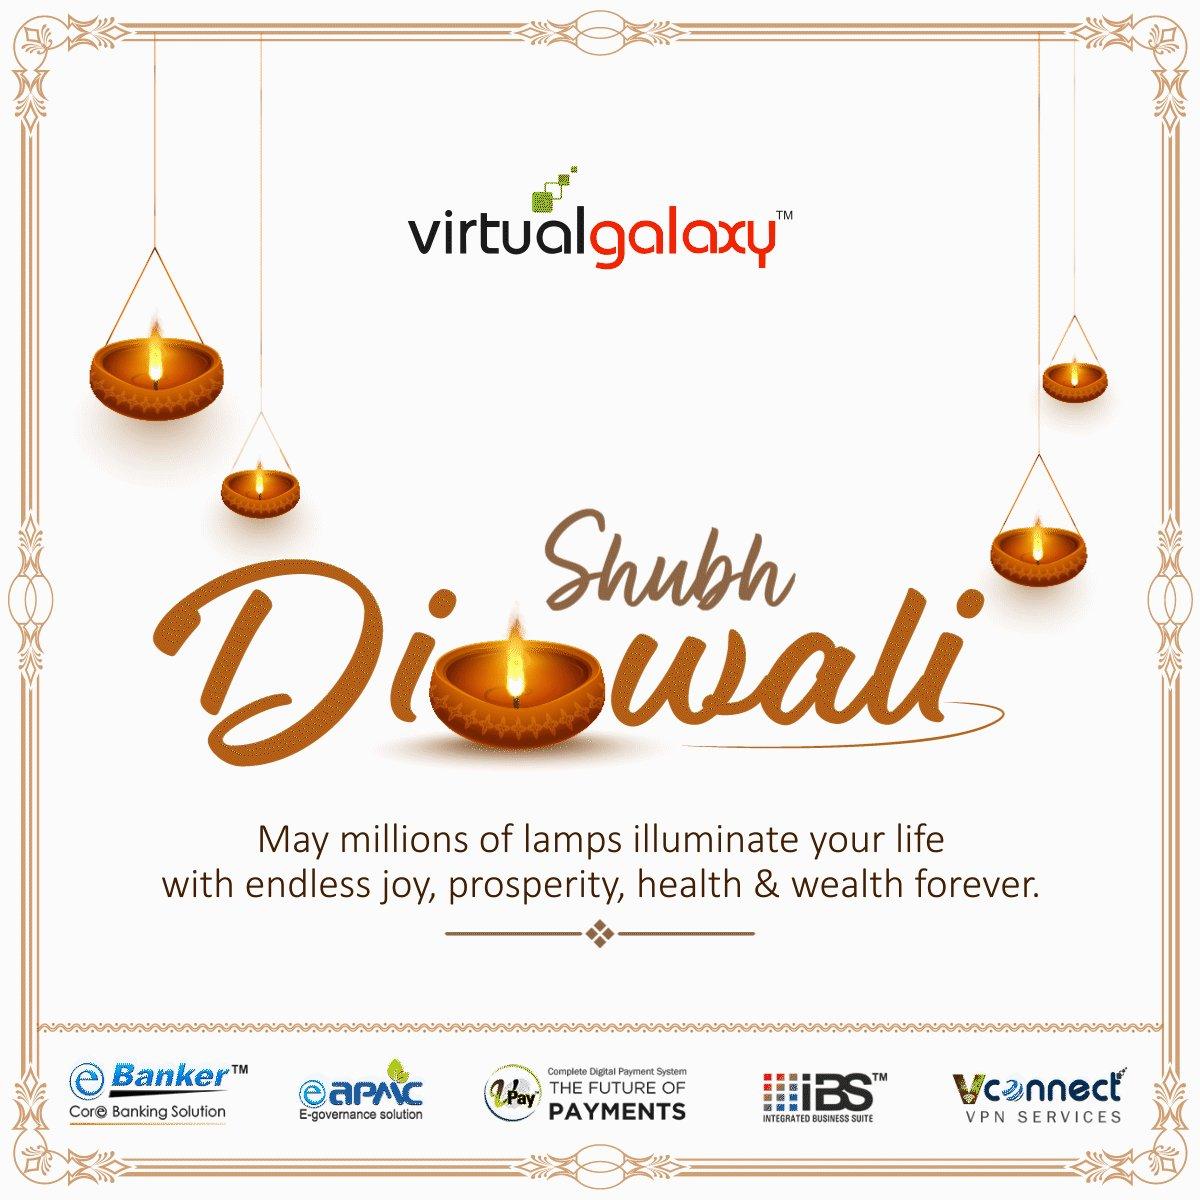 Let this Diwali burn all your bad times and enter you in good times. Happy Diwali!  #HappyDiwali#HappyDiwali2020#Diwali2020 #Diwali#Deepawali#deepavali2020 #indianfestival#greendiwali #vgipl #virtualgalaxy